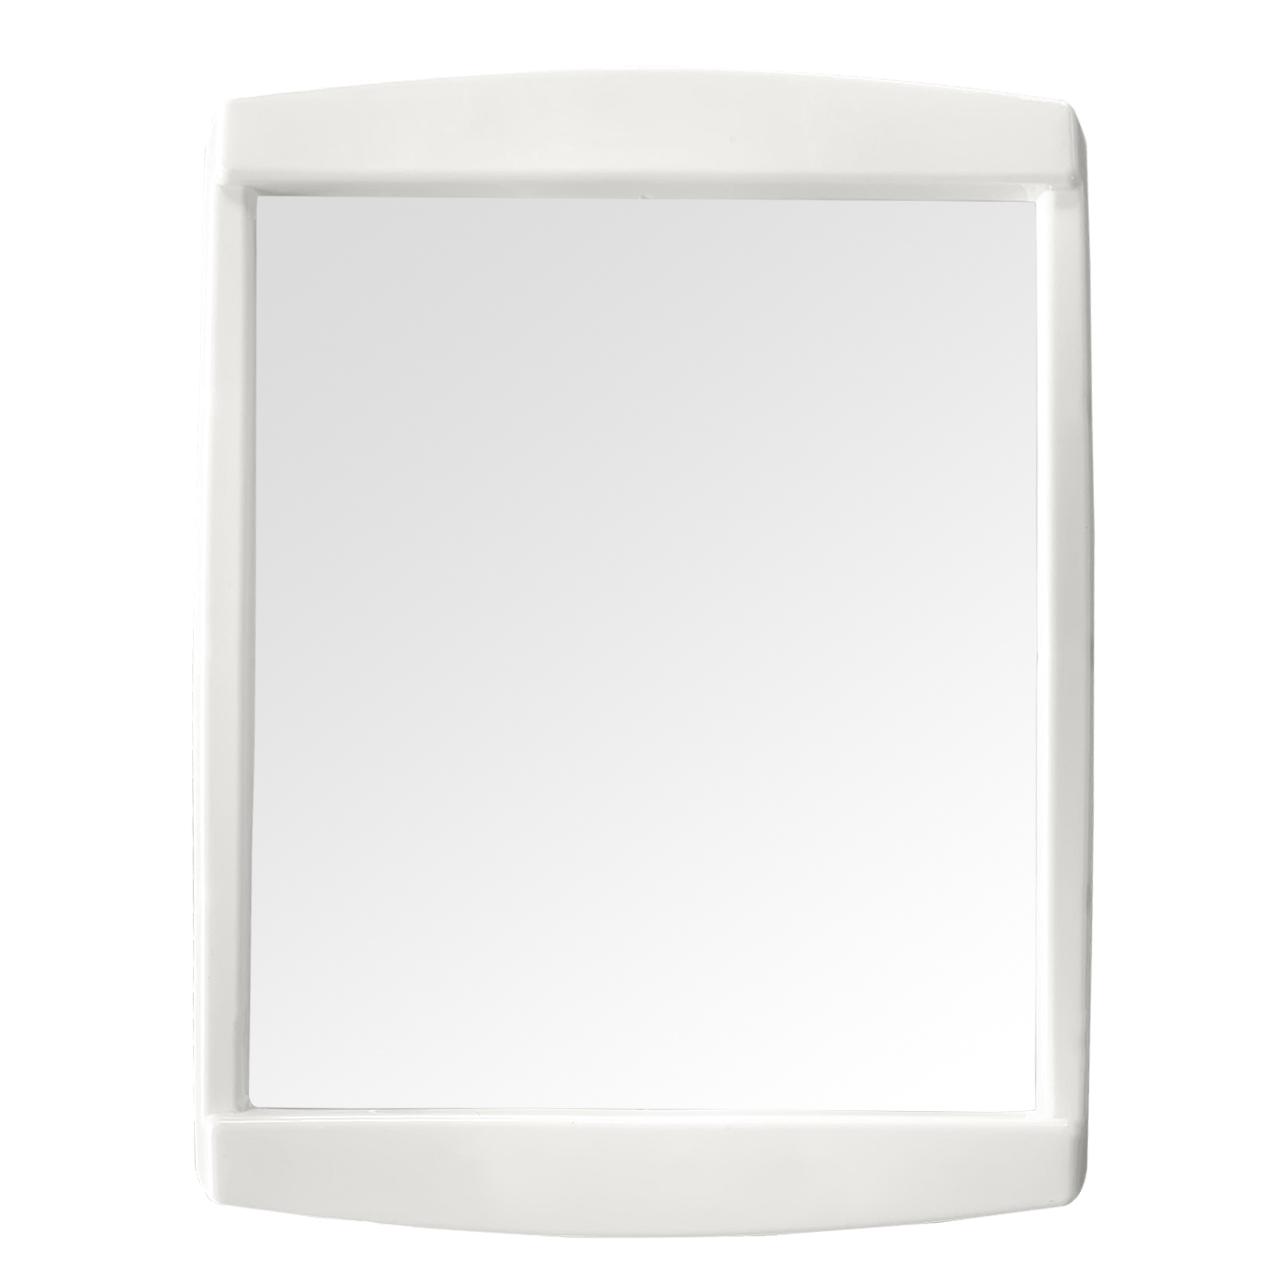 آینه الف پلاستیک مدل آرا-1